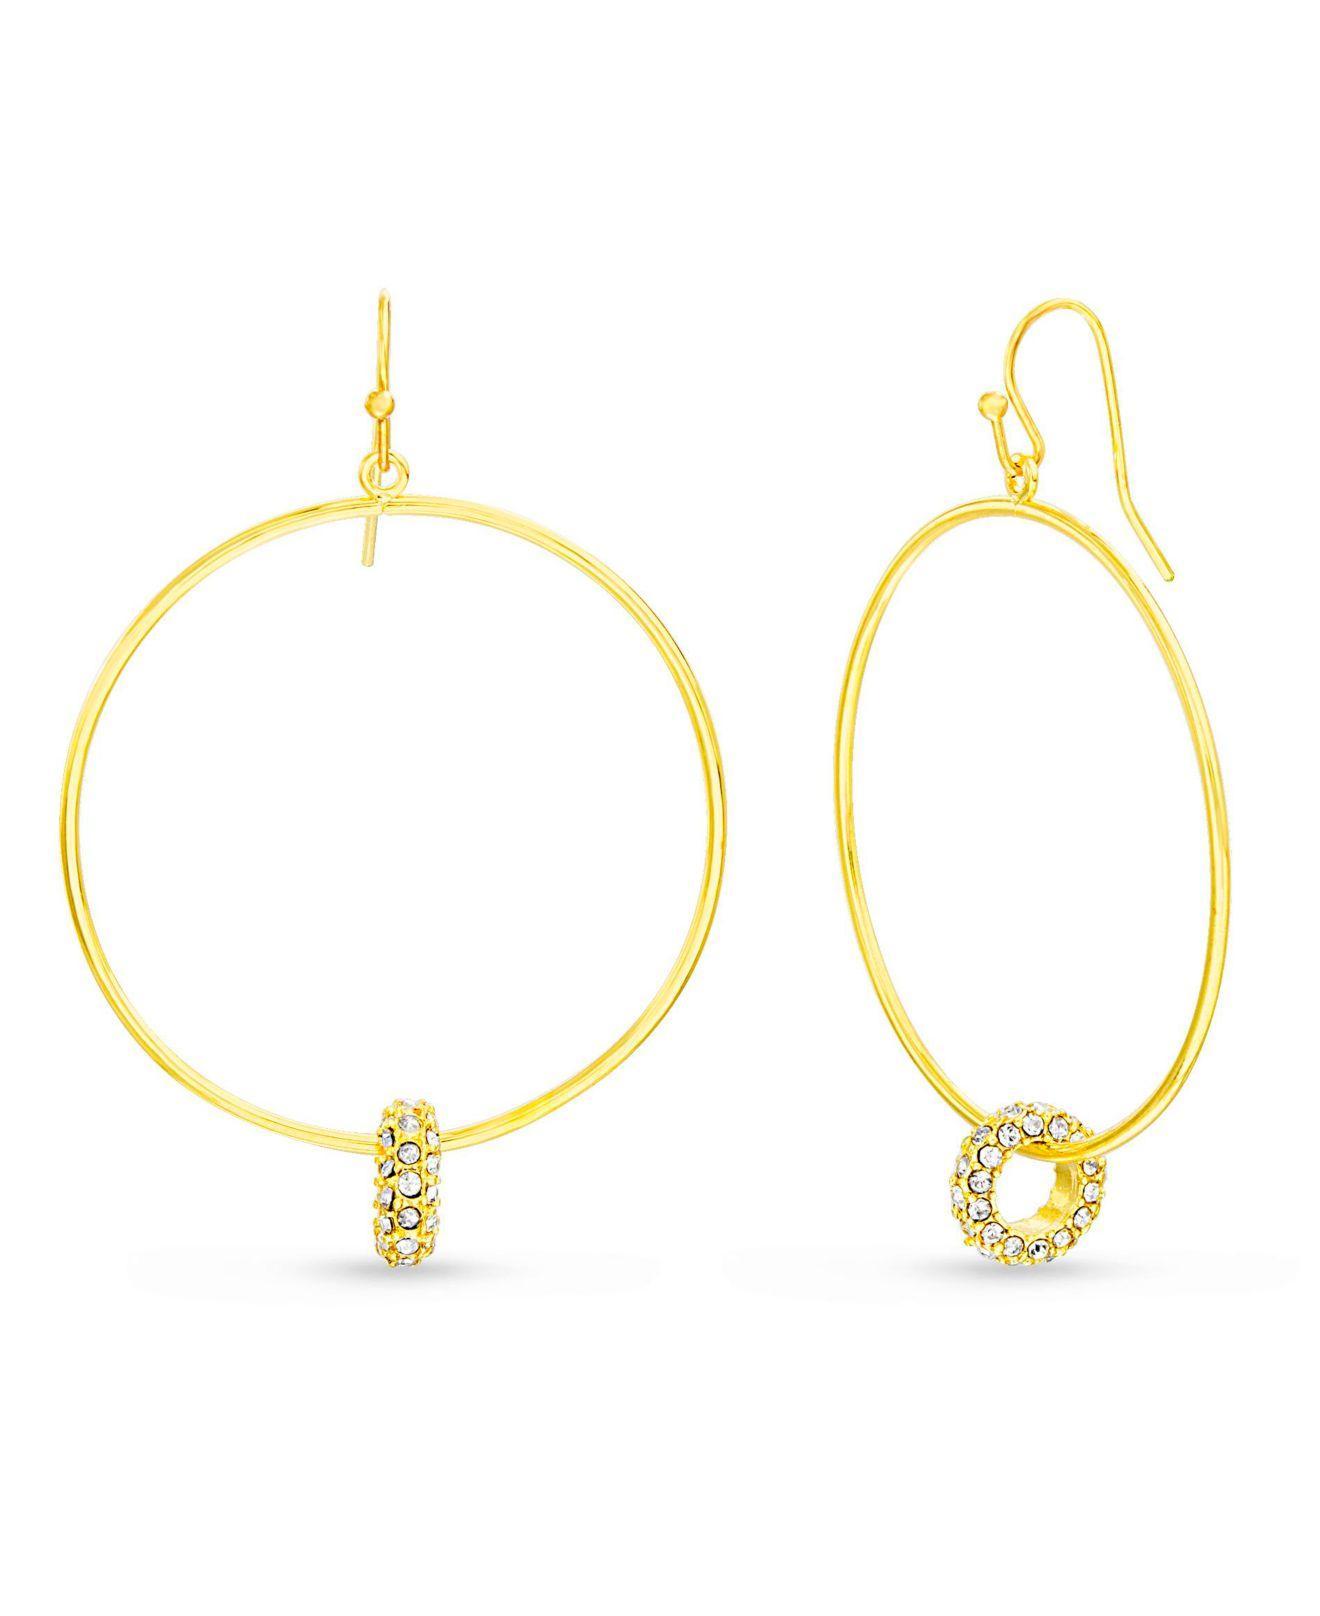 5023627c0c0364 Lyst - Kensie White Rhinestone Interlocking Circle Yellow Gold-tone ...